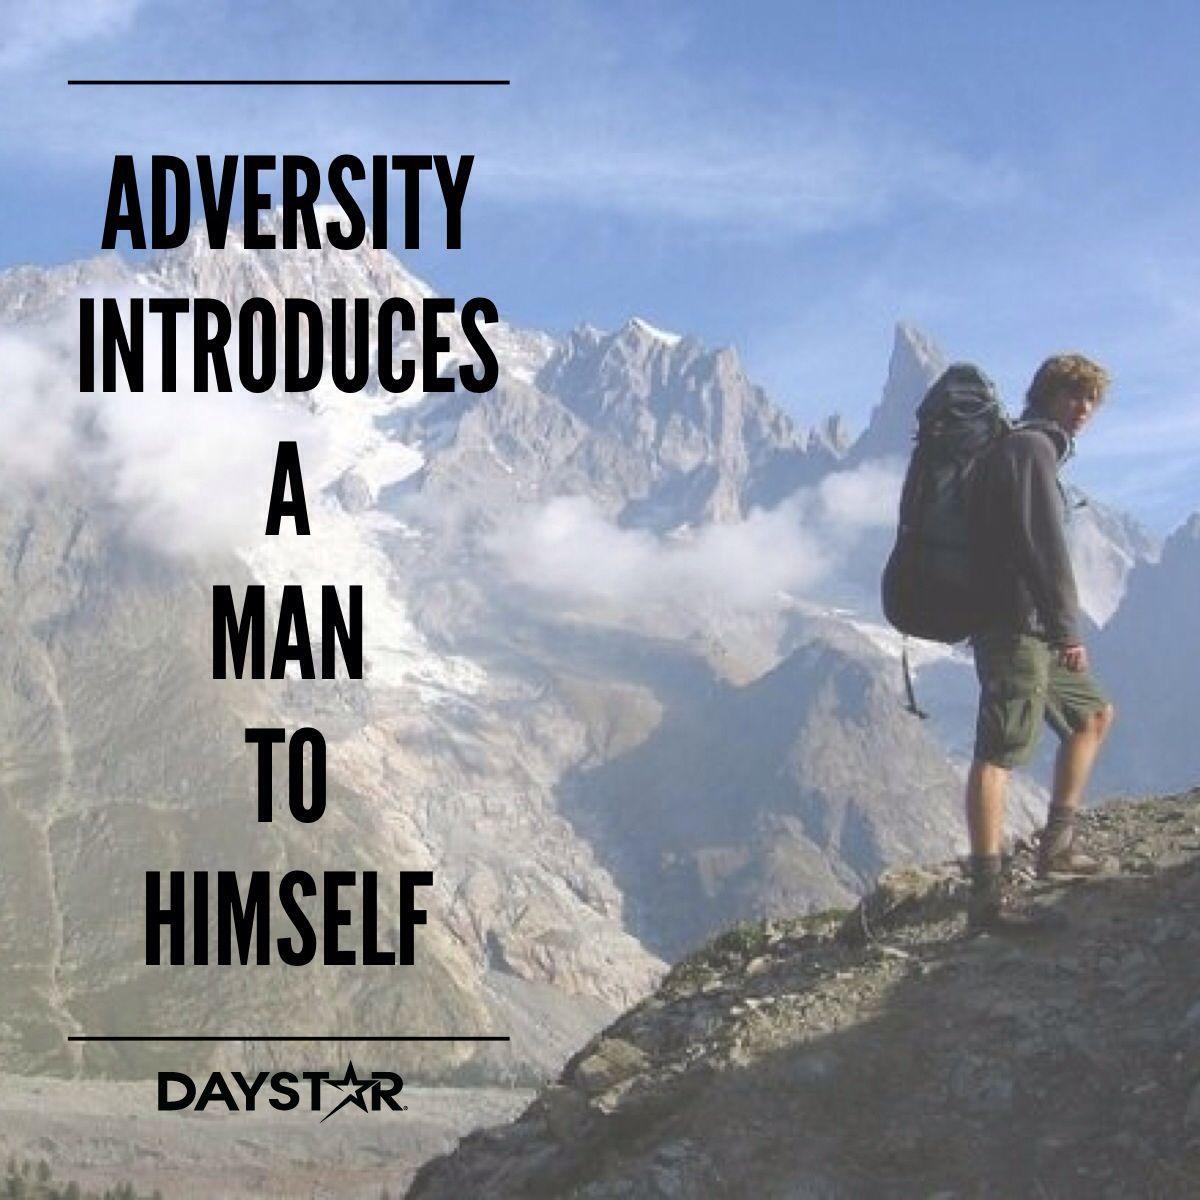 Adversity Introduces A Man To Himself Daystar